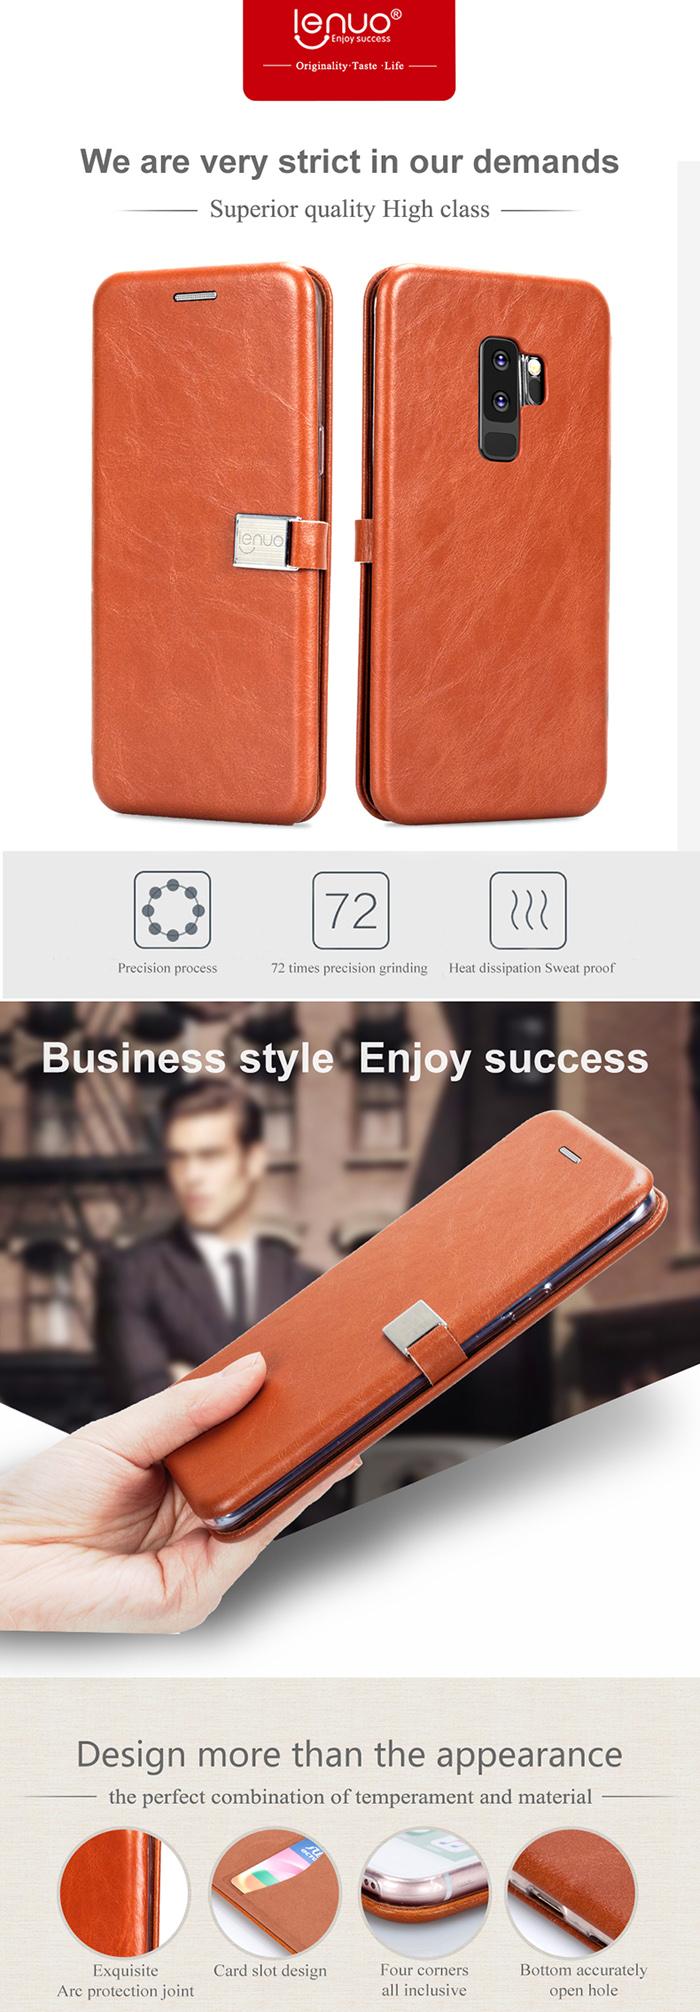 Bao da Galaxy S9 Plus Lenuo Lebe Flip Case độc đáo, đẹp mắt 2